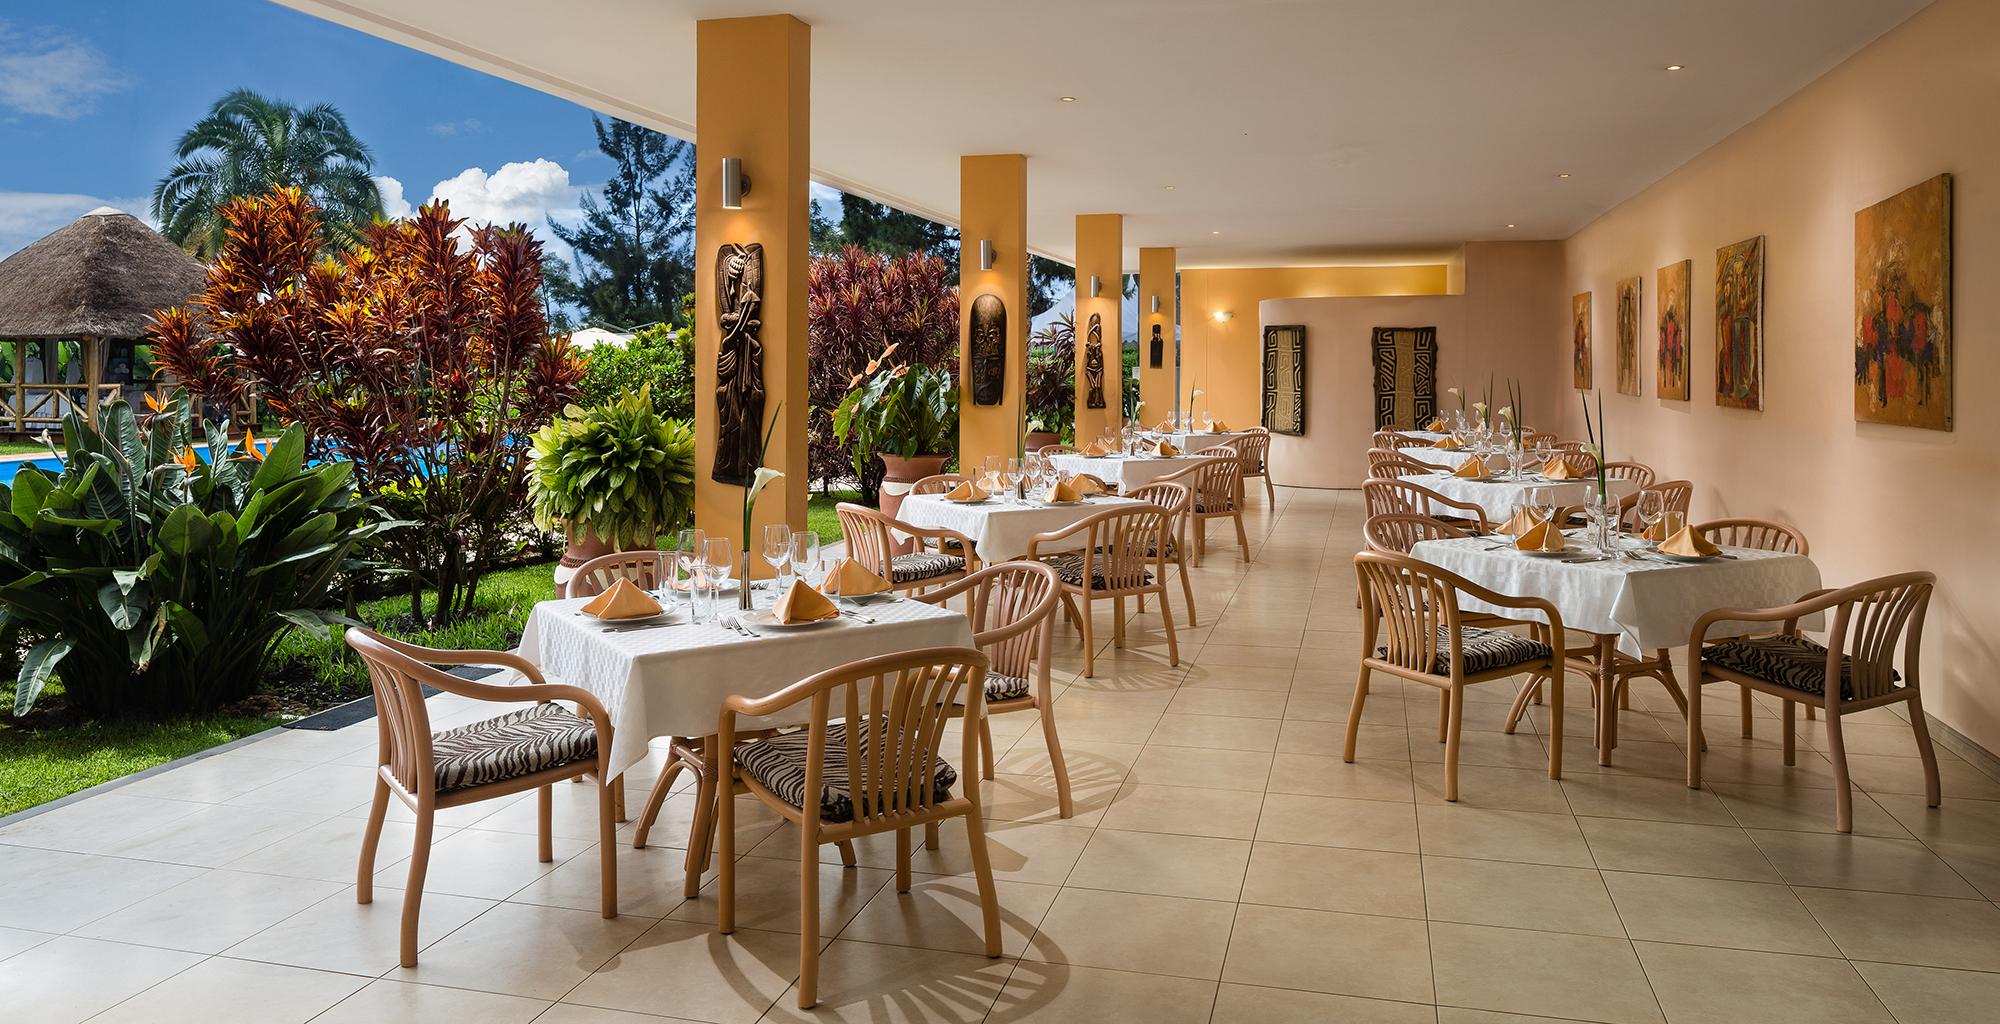 Rwanda-Hotel-Mille-Collines-Terrace